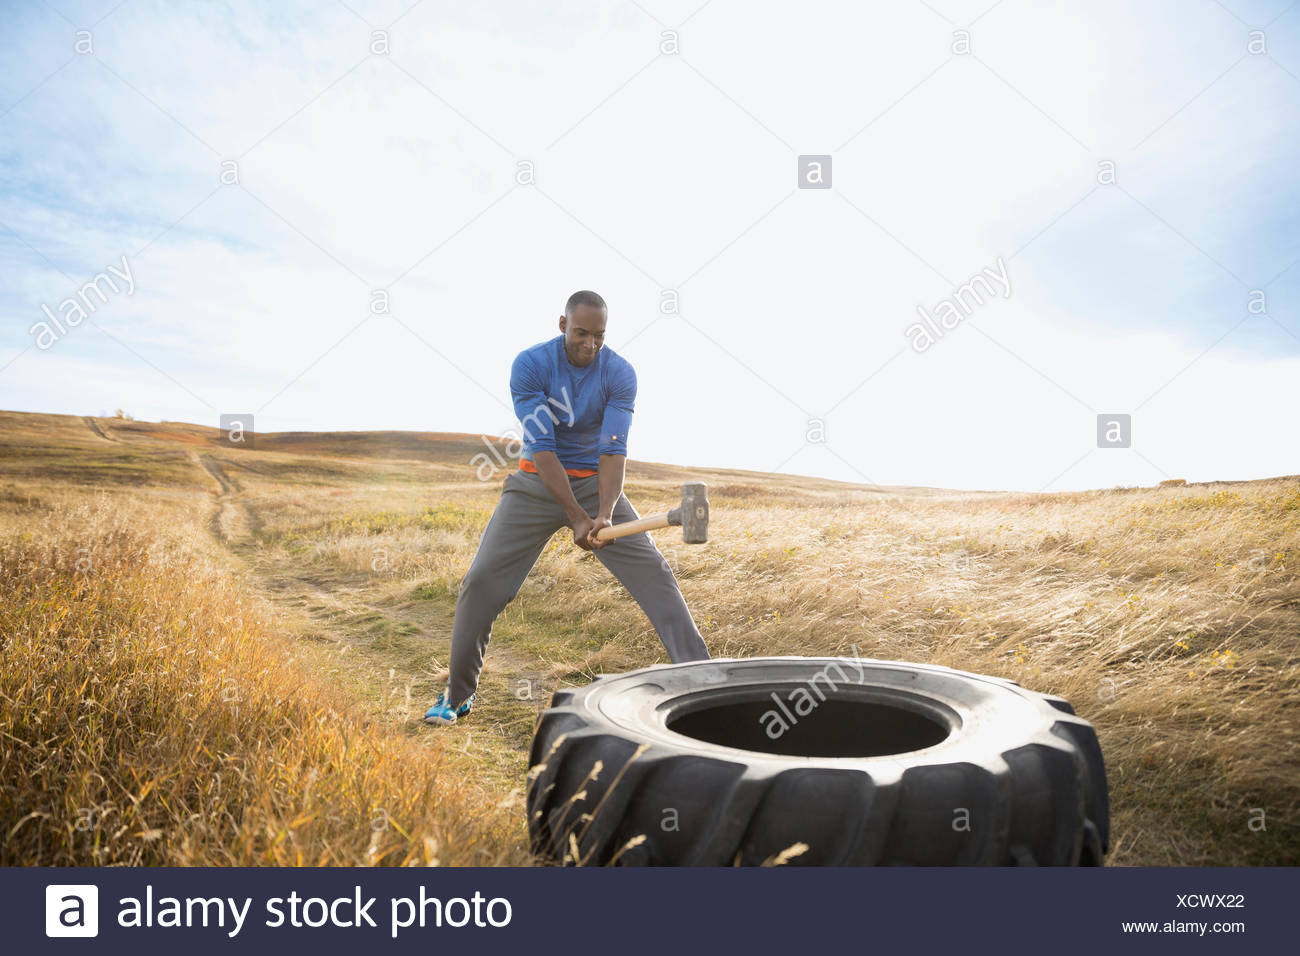 Man hammering crossfit tire in sunny rural field - Stock Image